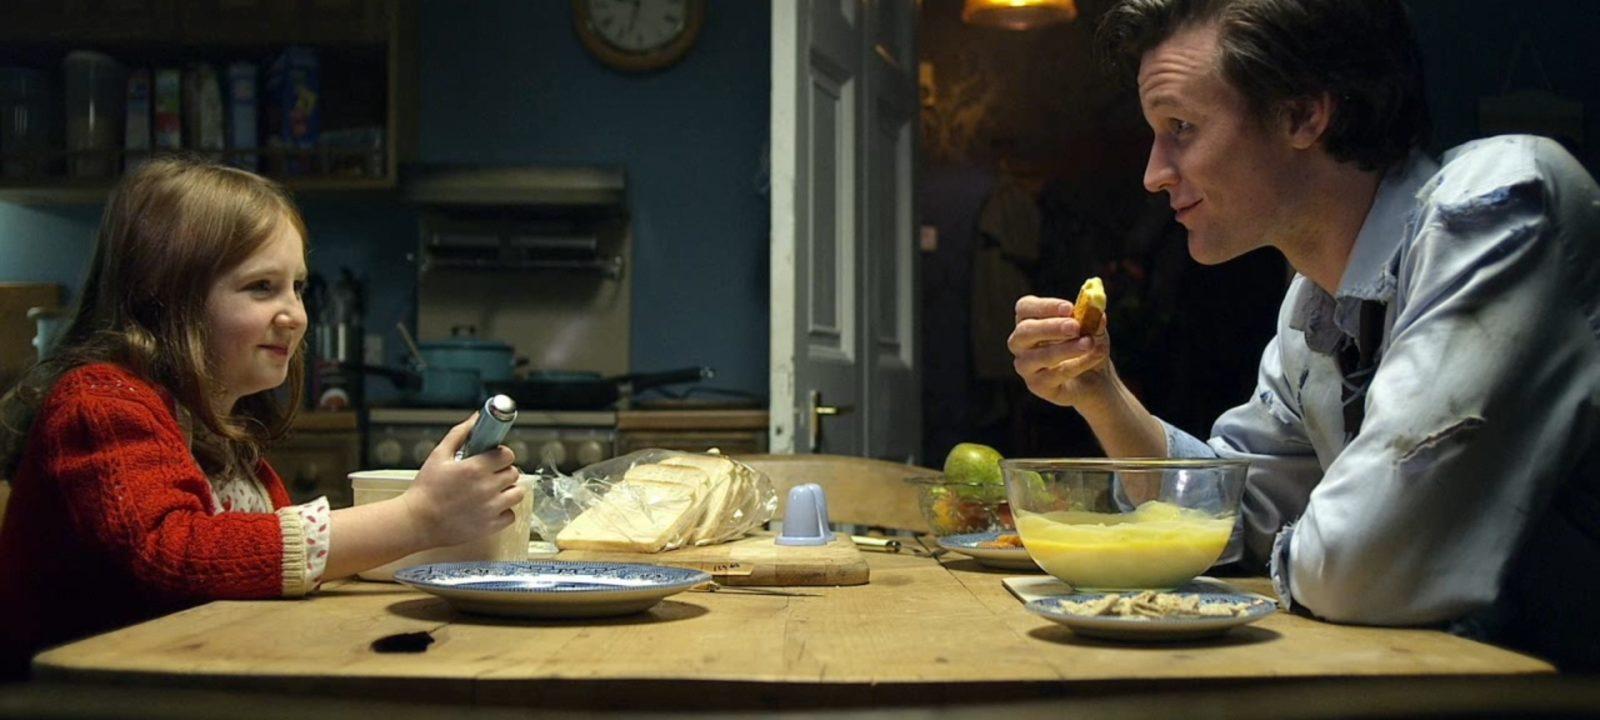 'The Eleventh Hour' (Photo: BBC)